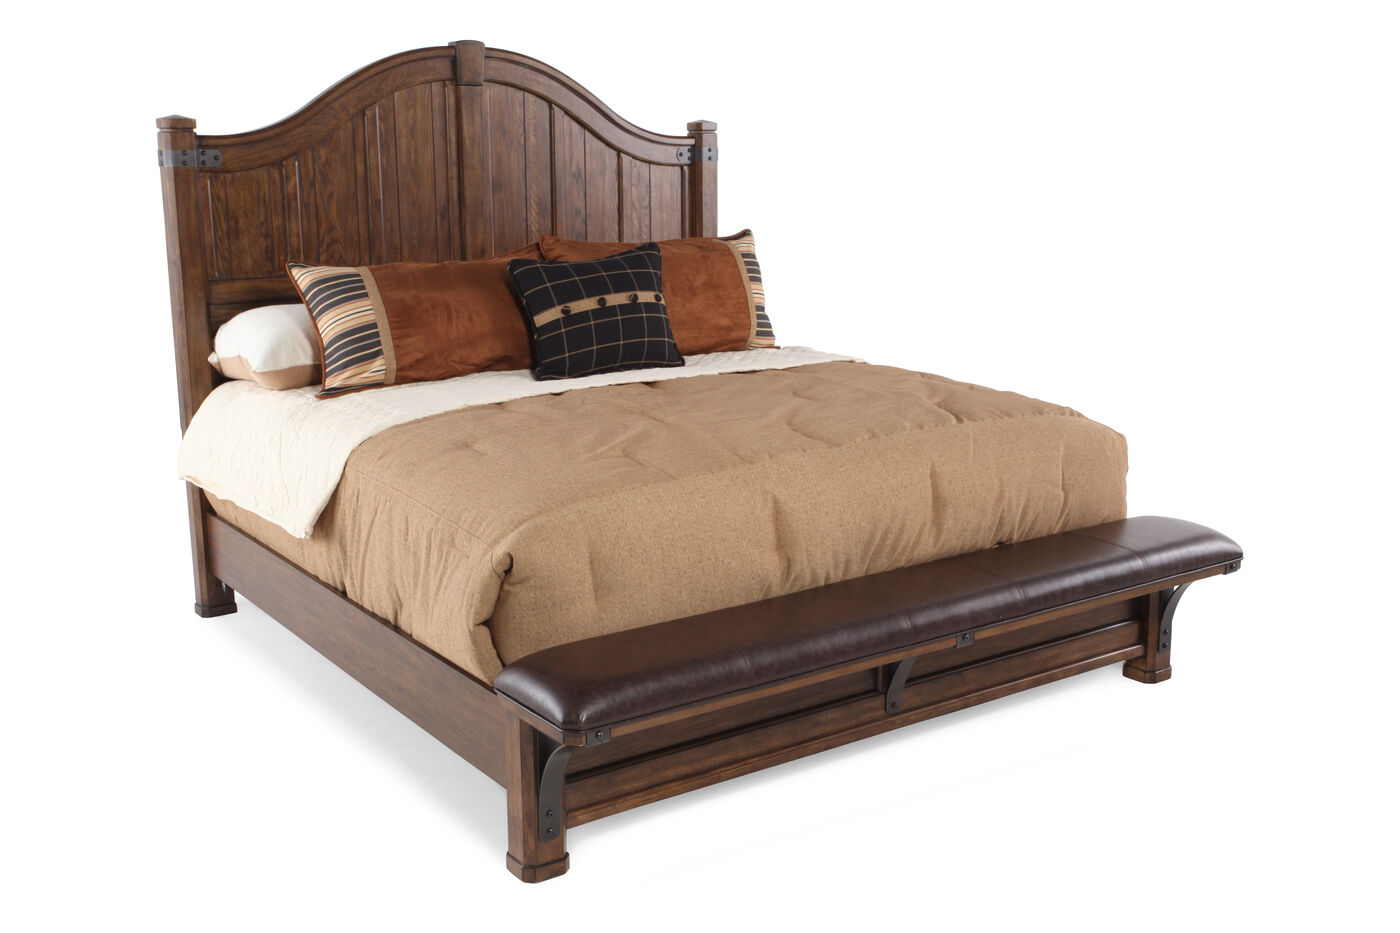 Heartland Falls King Bed